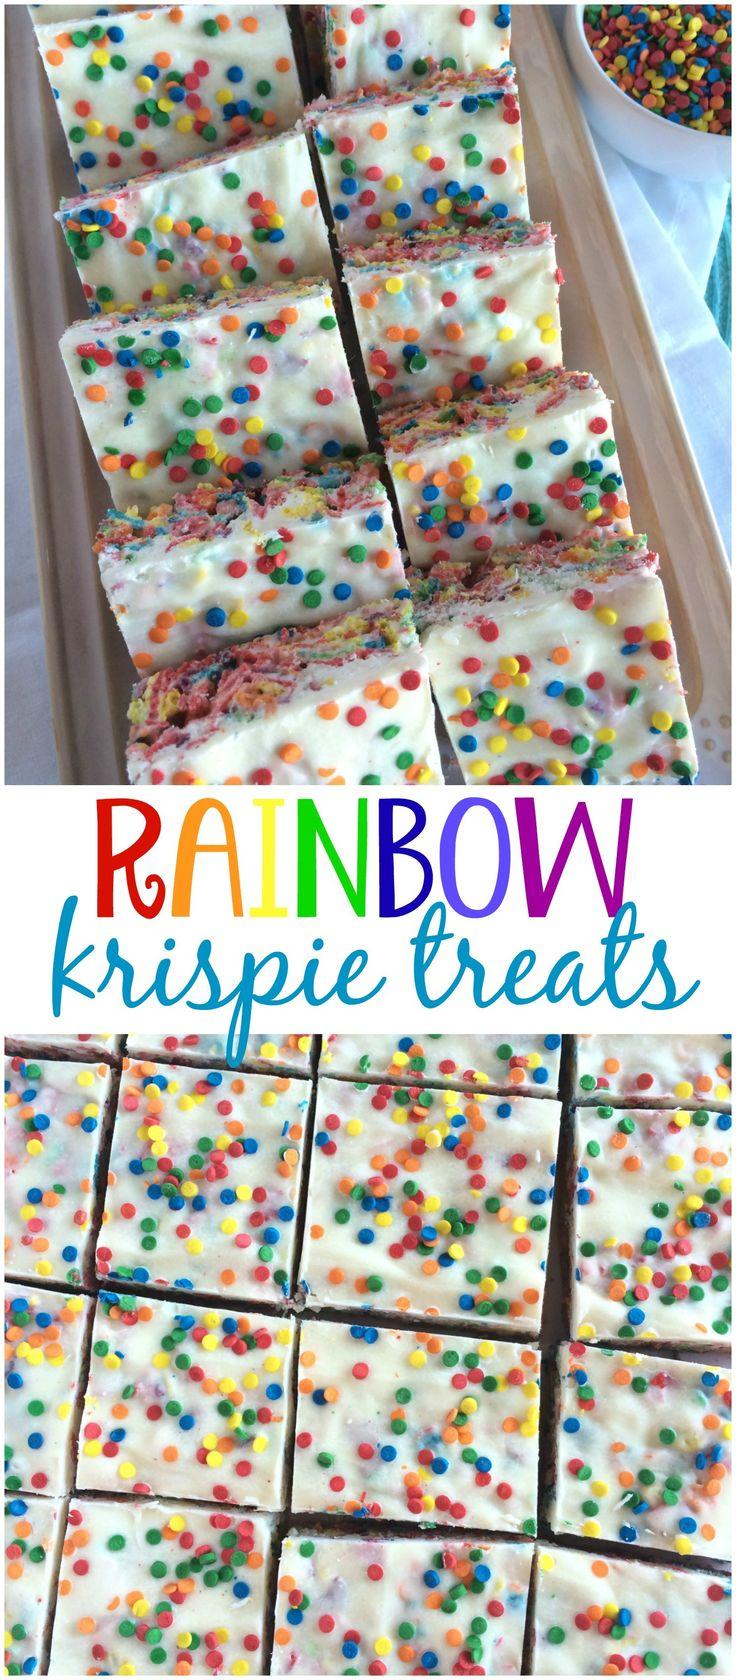 RAINBOW KRISPIE TREATS | easy, 5 minute, no-bake treat! www.togetherasfamily.com